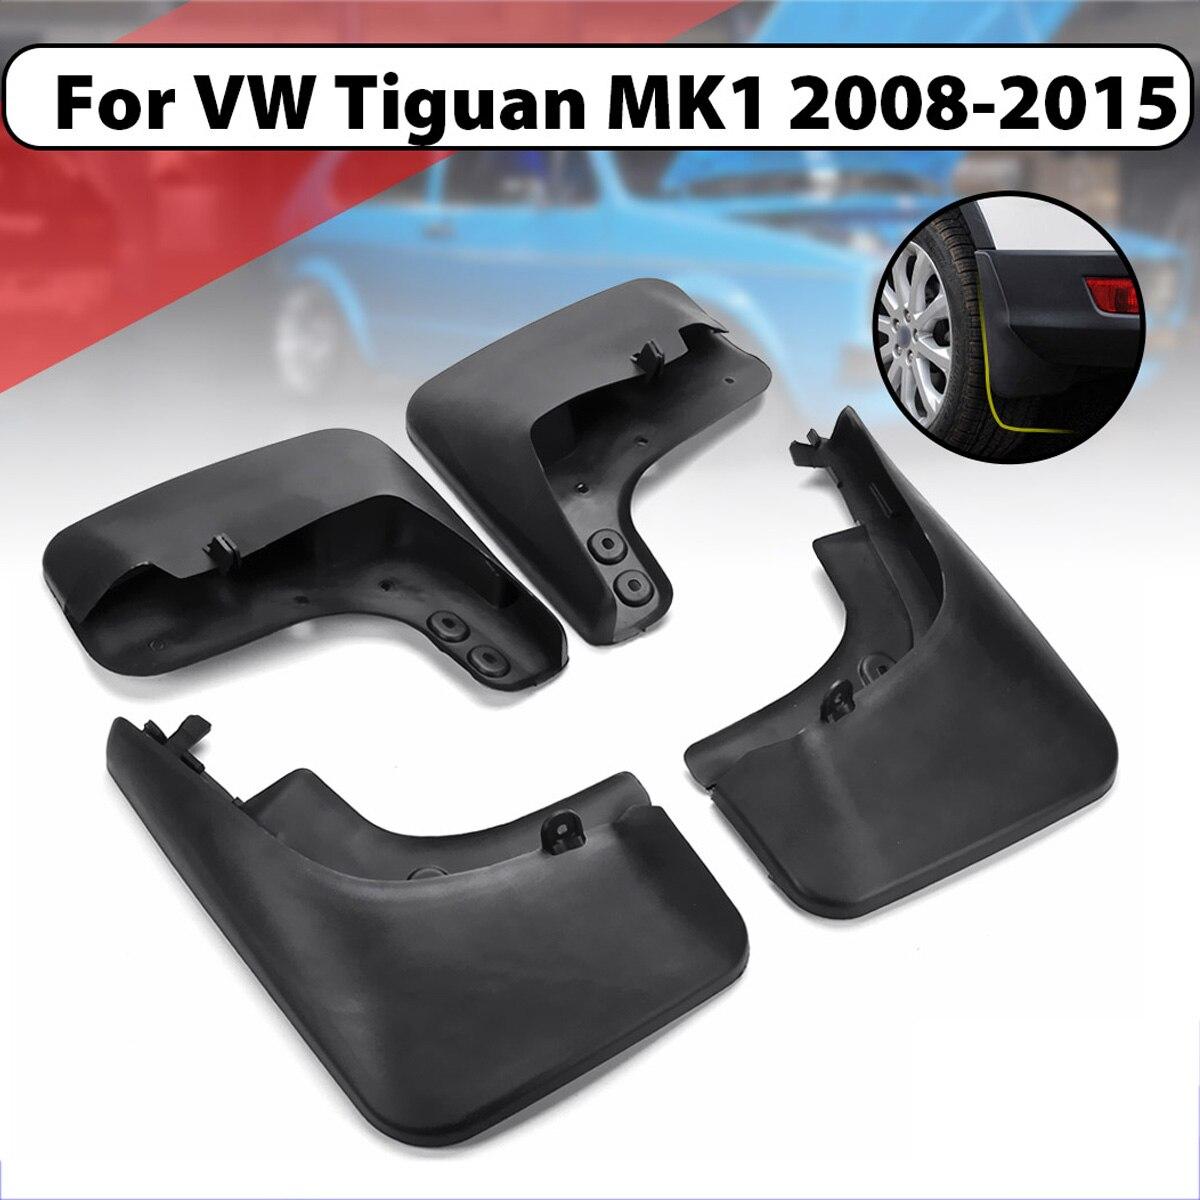 Брызговики для VW Tiguan MK1 2008 2015 Fender Брызговики спереди и сзади брызговики крылья 2009 2010 2011 2012 2013 2014 2015